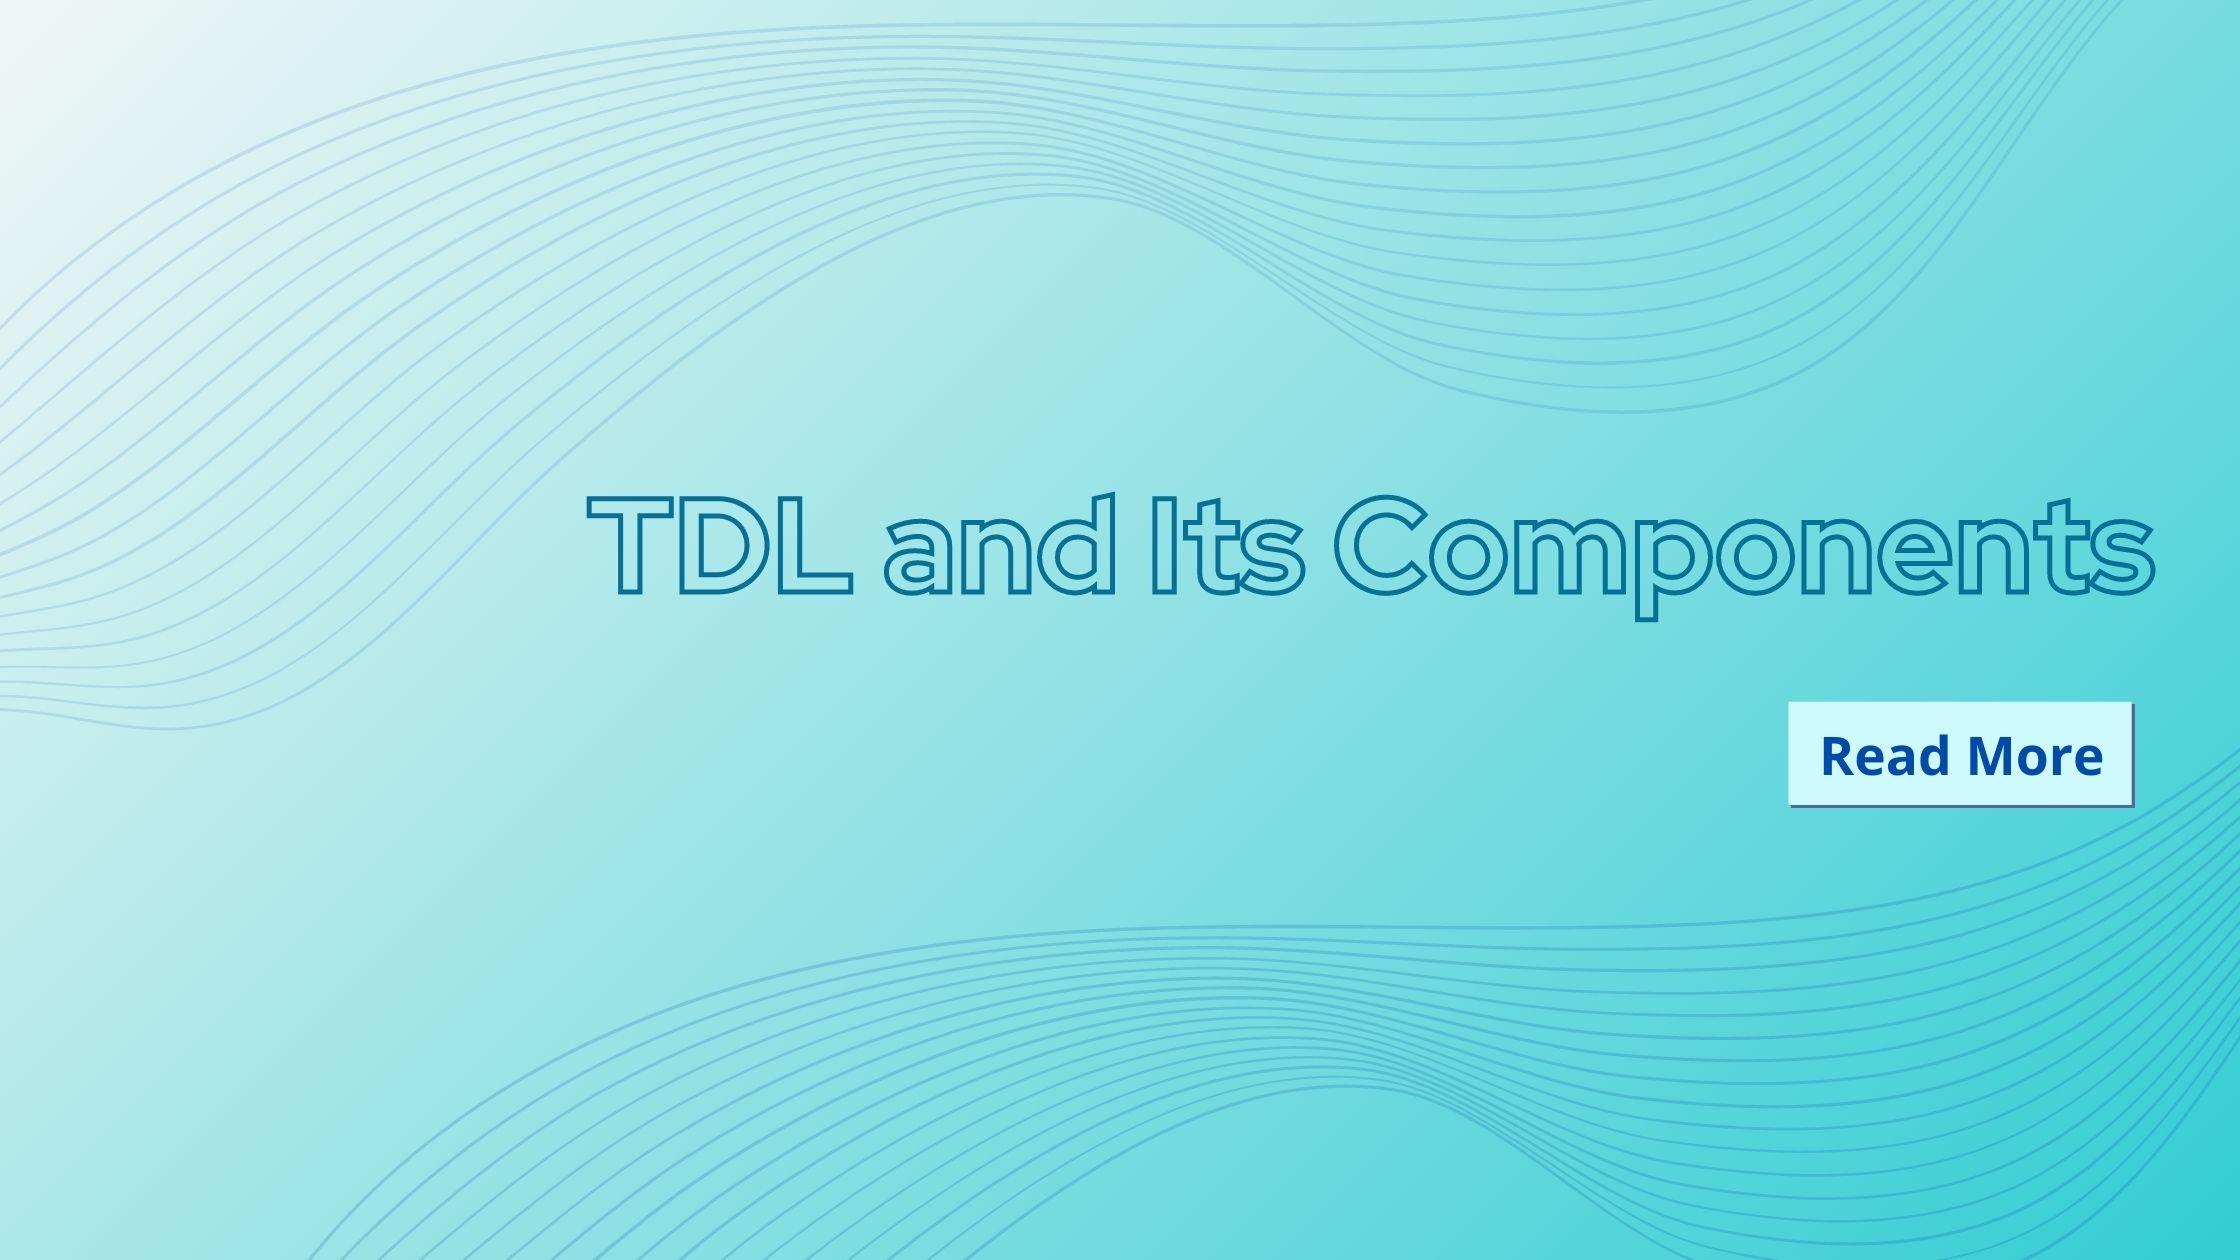 TDL components